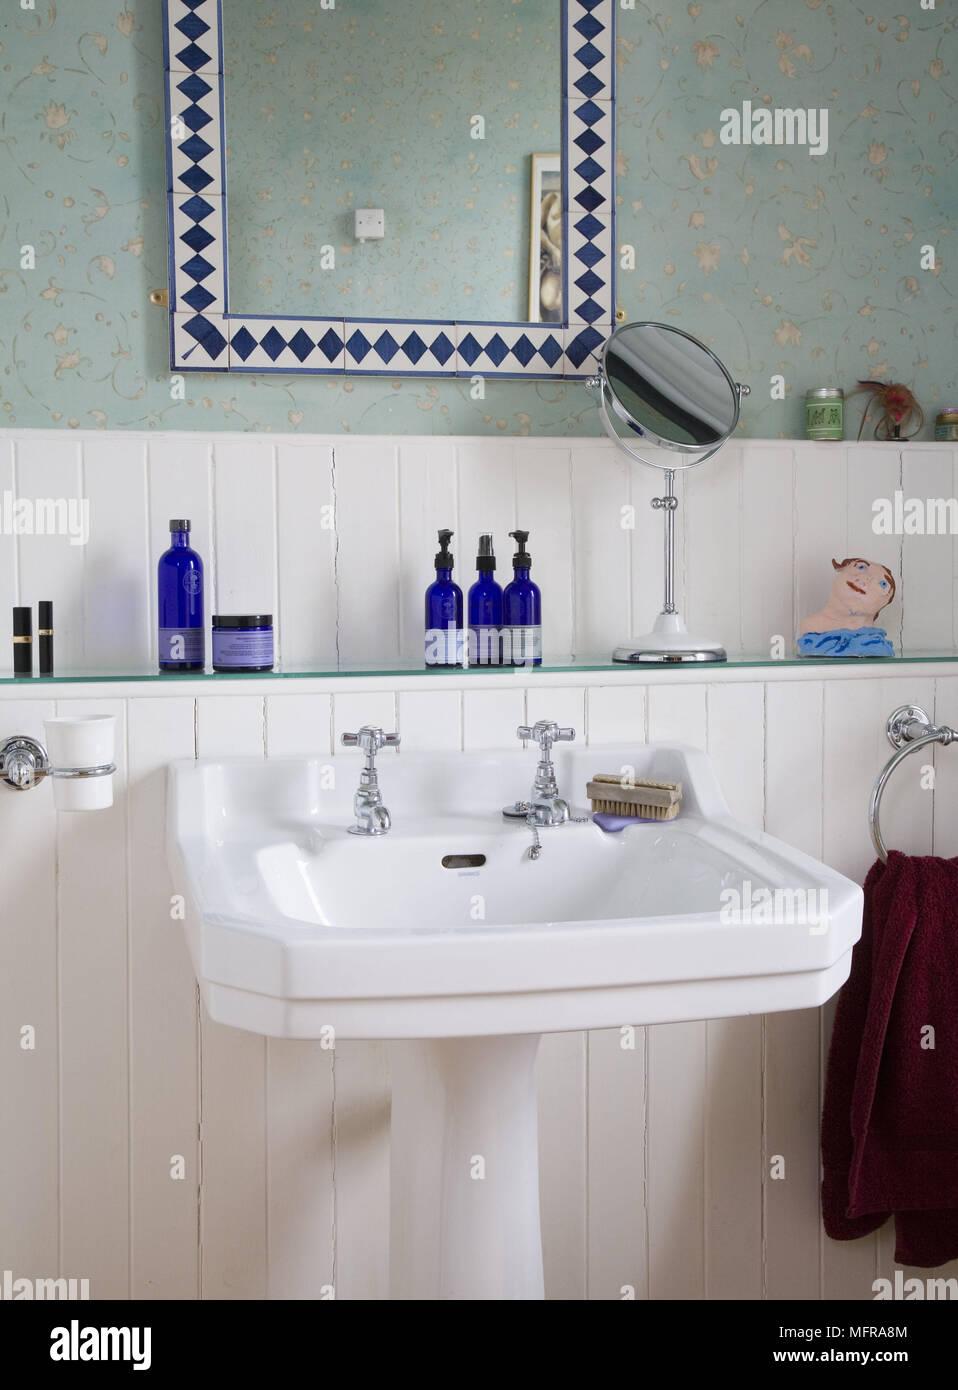 https www alamy com toiletries on glass shelf above victorian style pedestal washbasin in blue bathroom image181836500 html